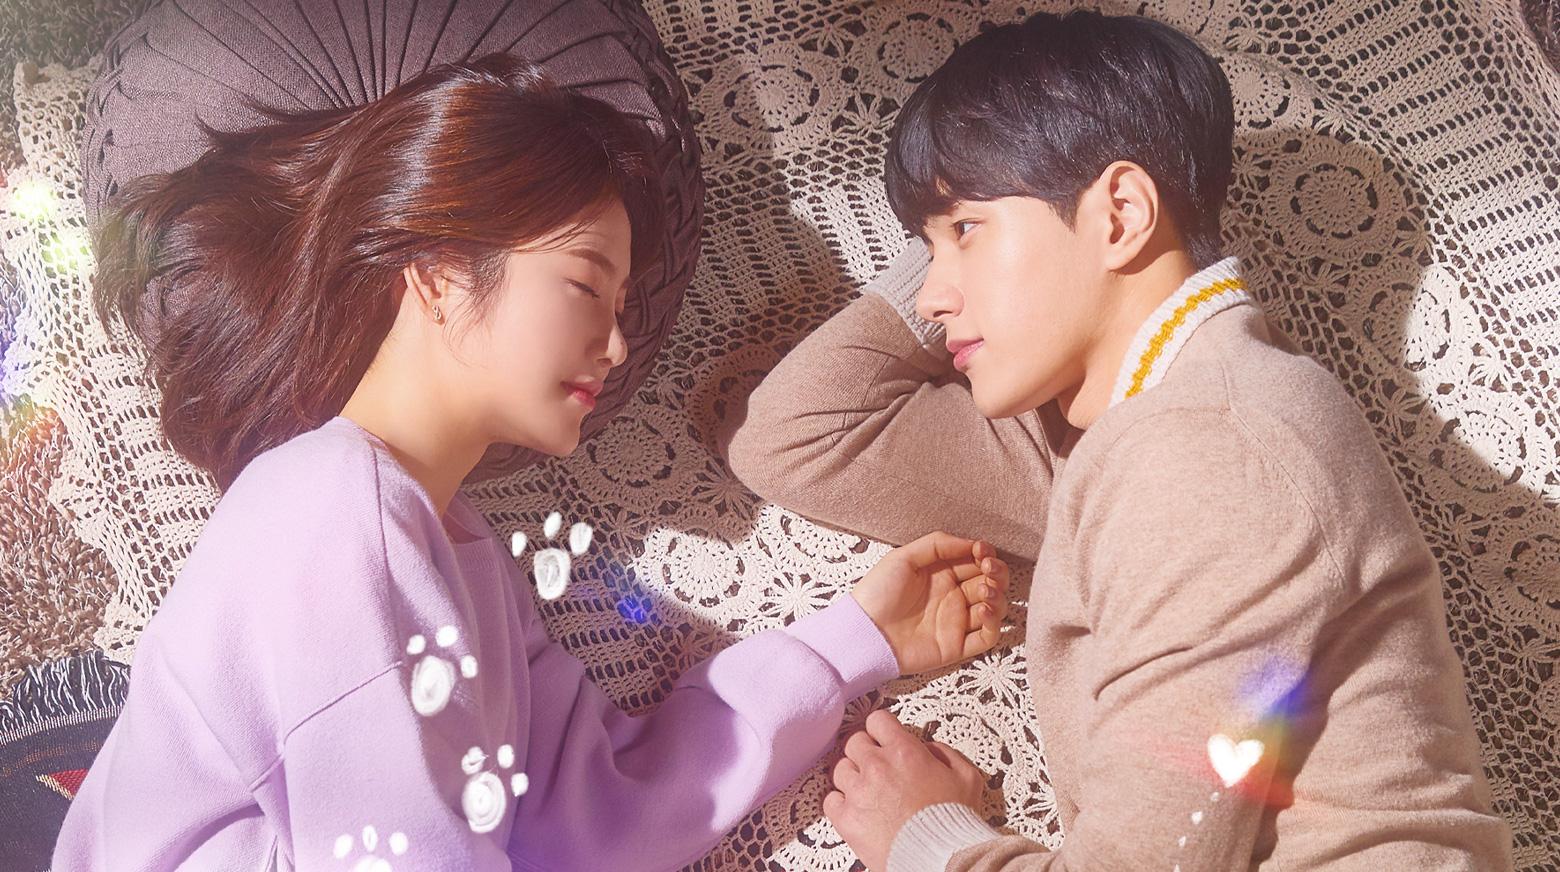 40 Questions Korean Drama - Meow. The Secret Boy